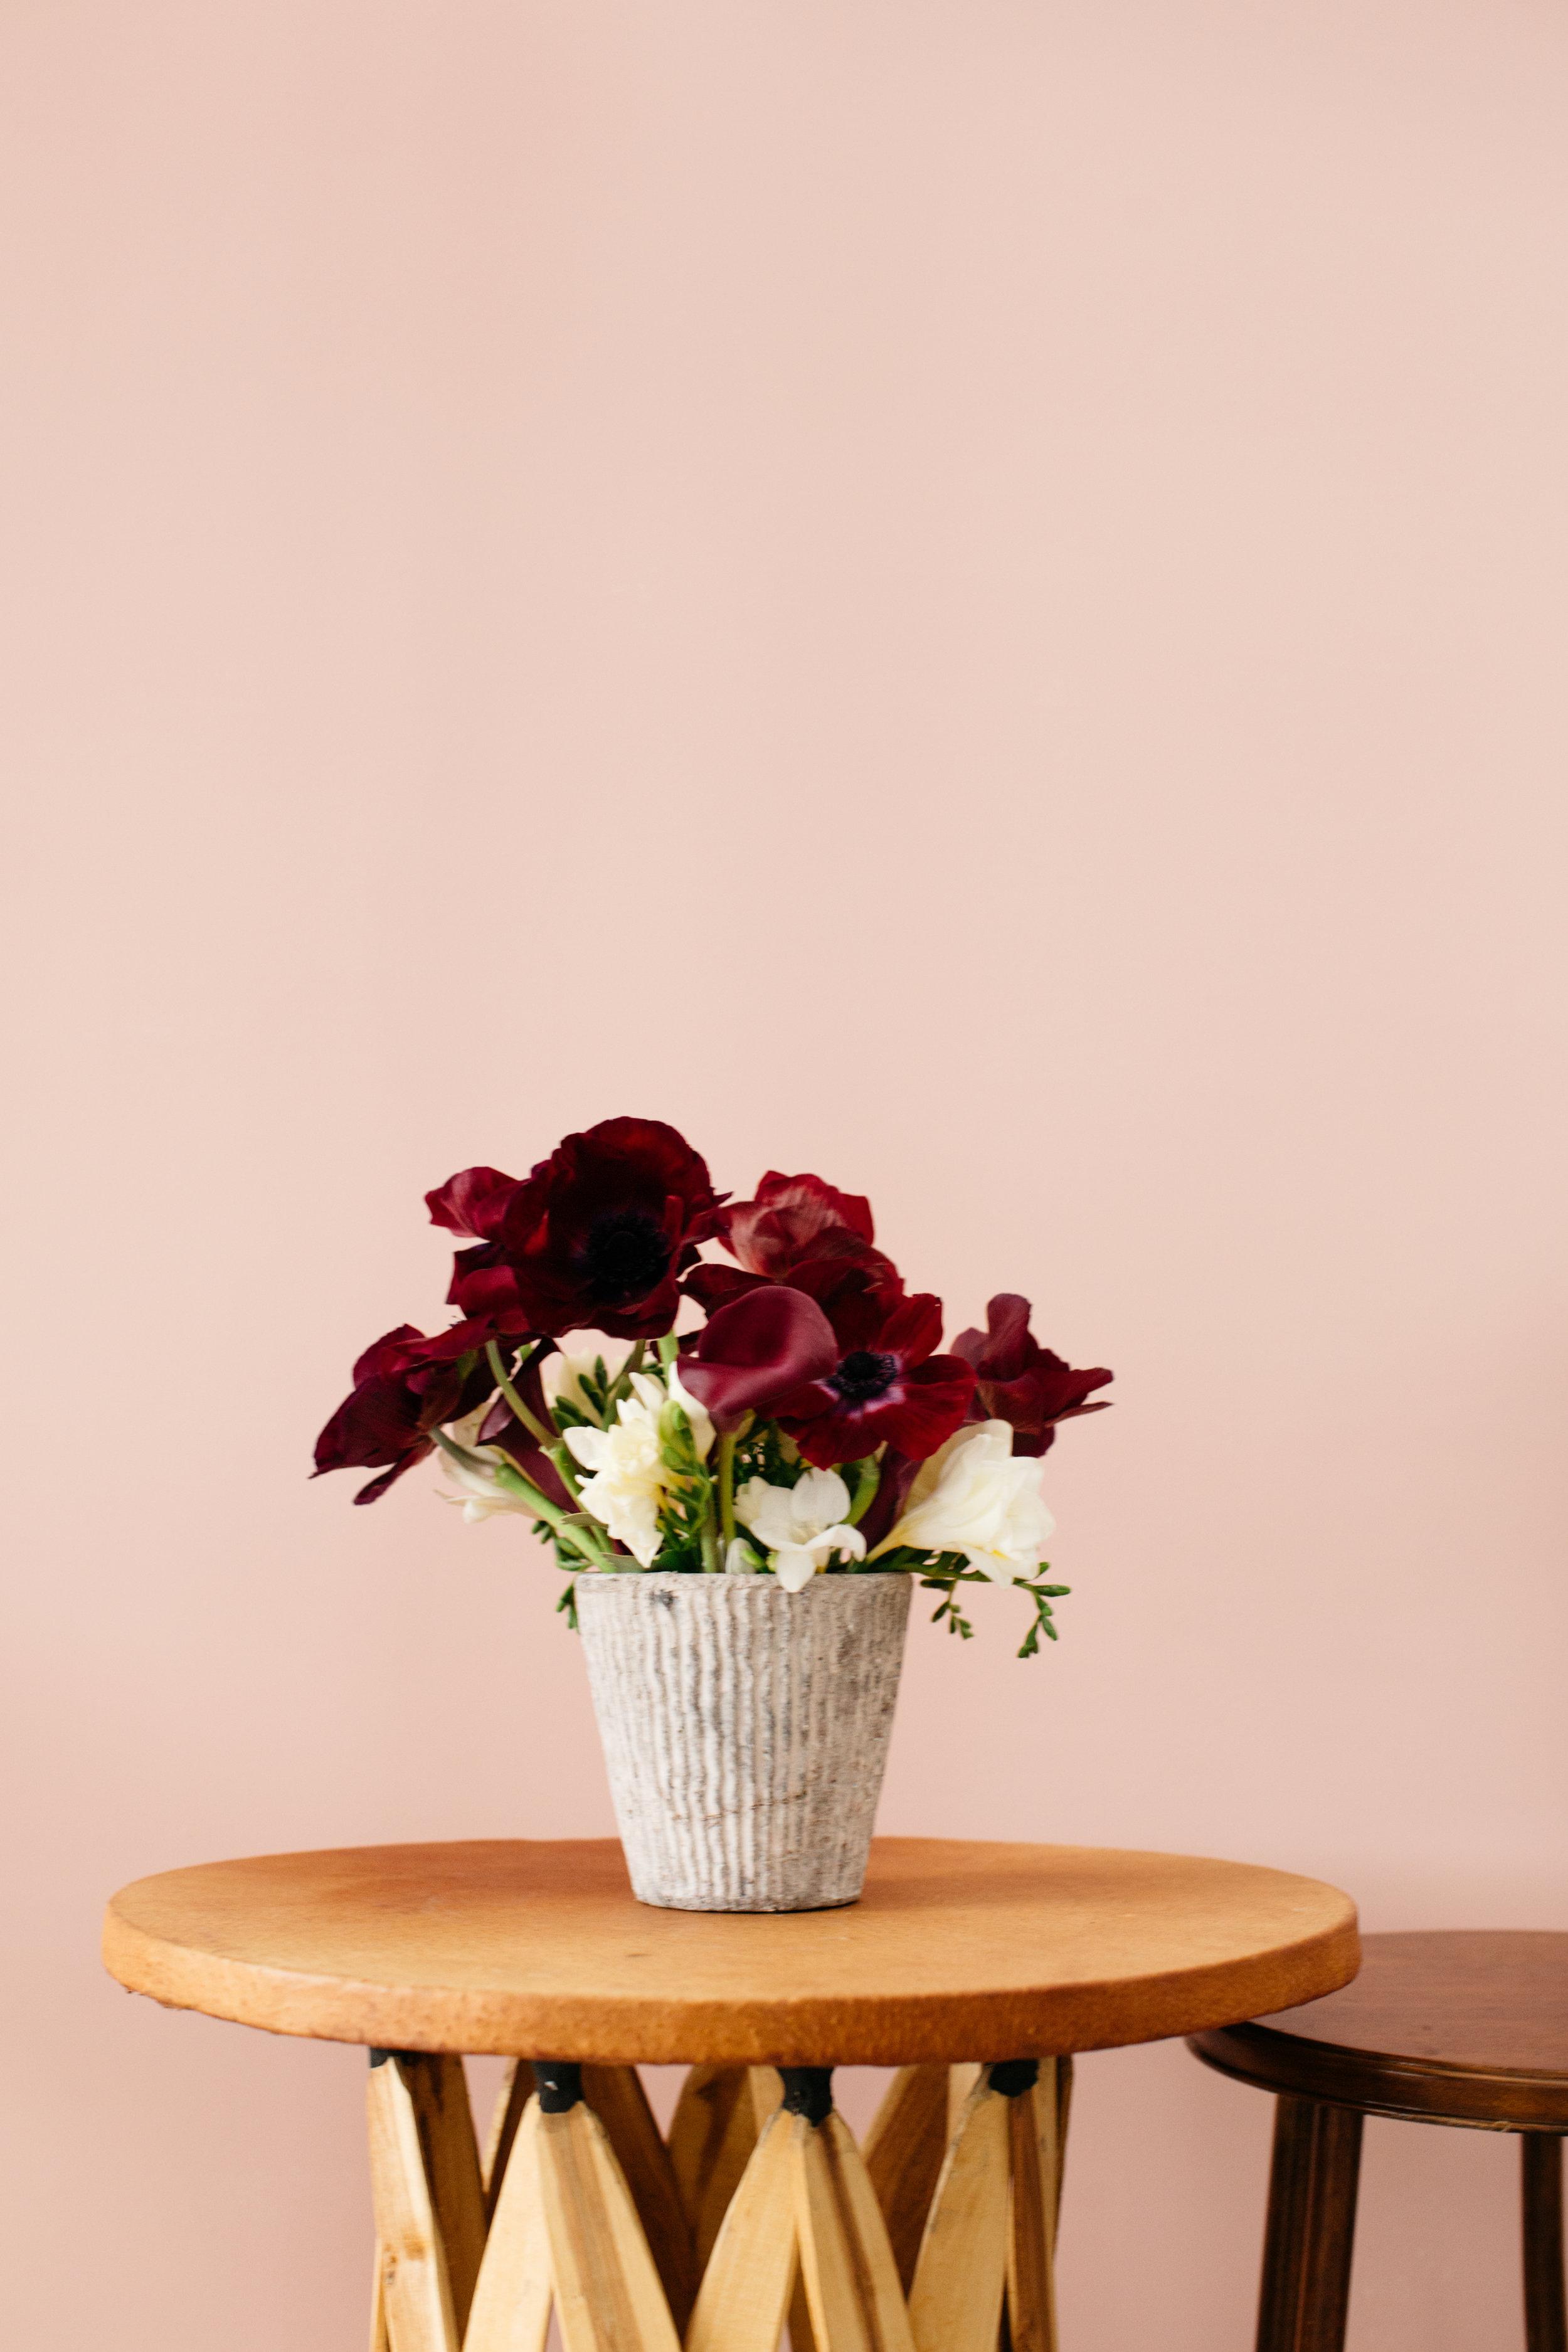 bloom-and-press-cos-theepsstudio-49.jpg